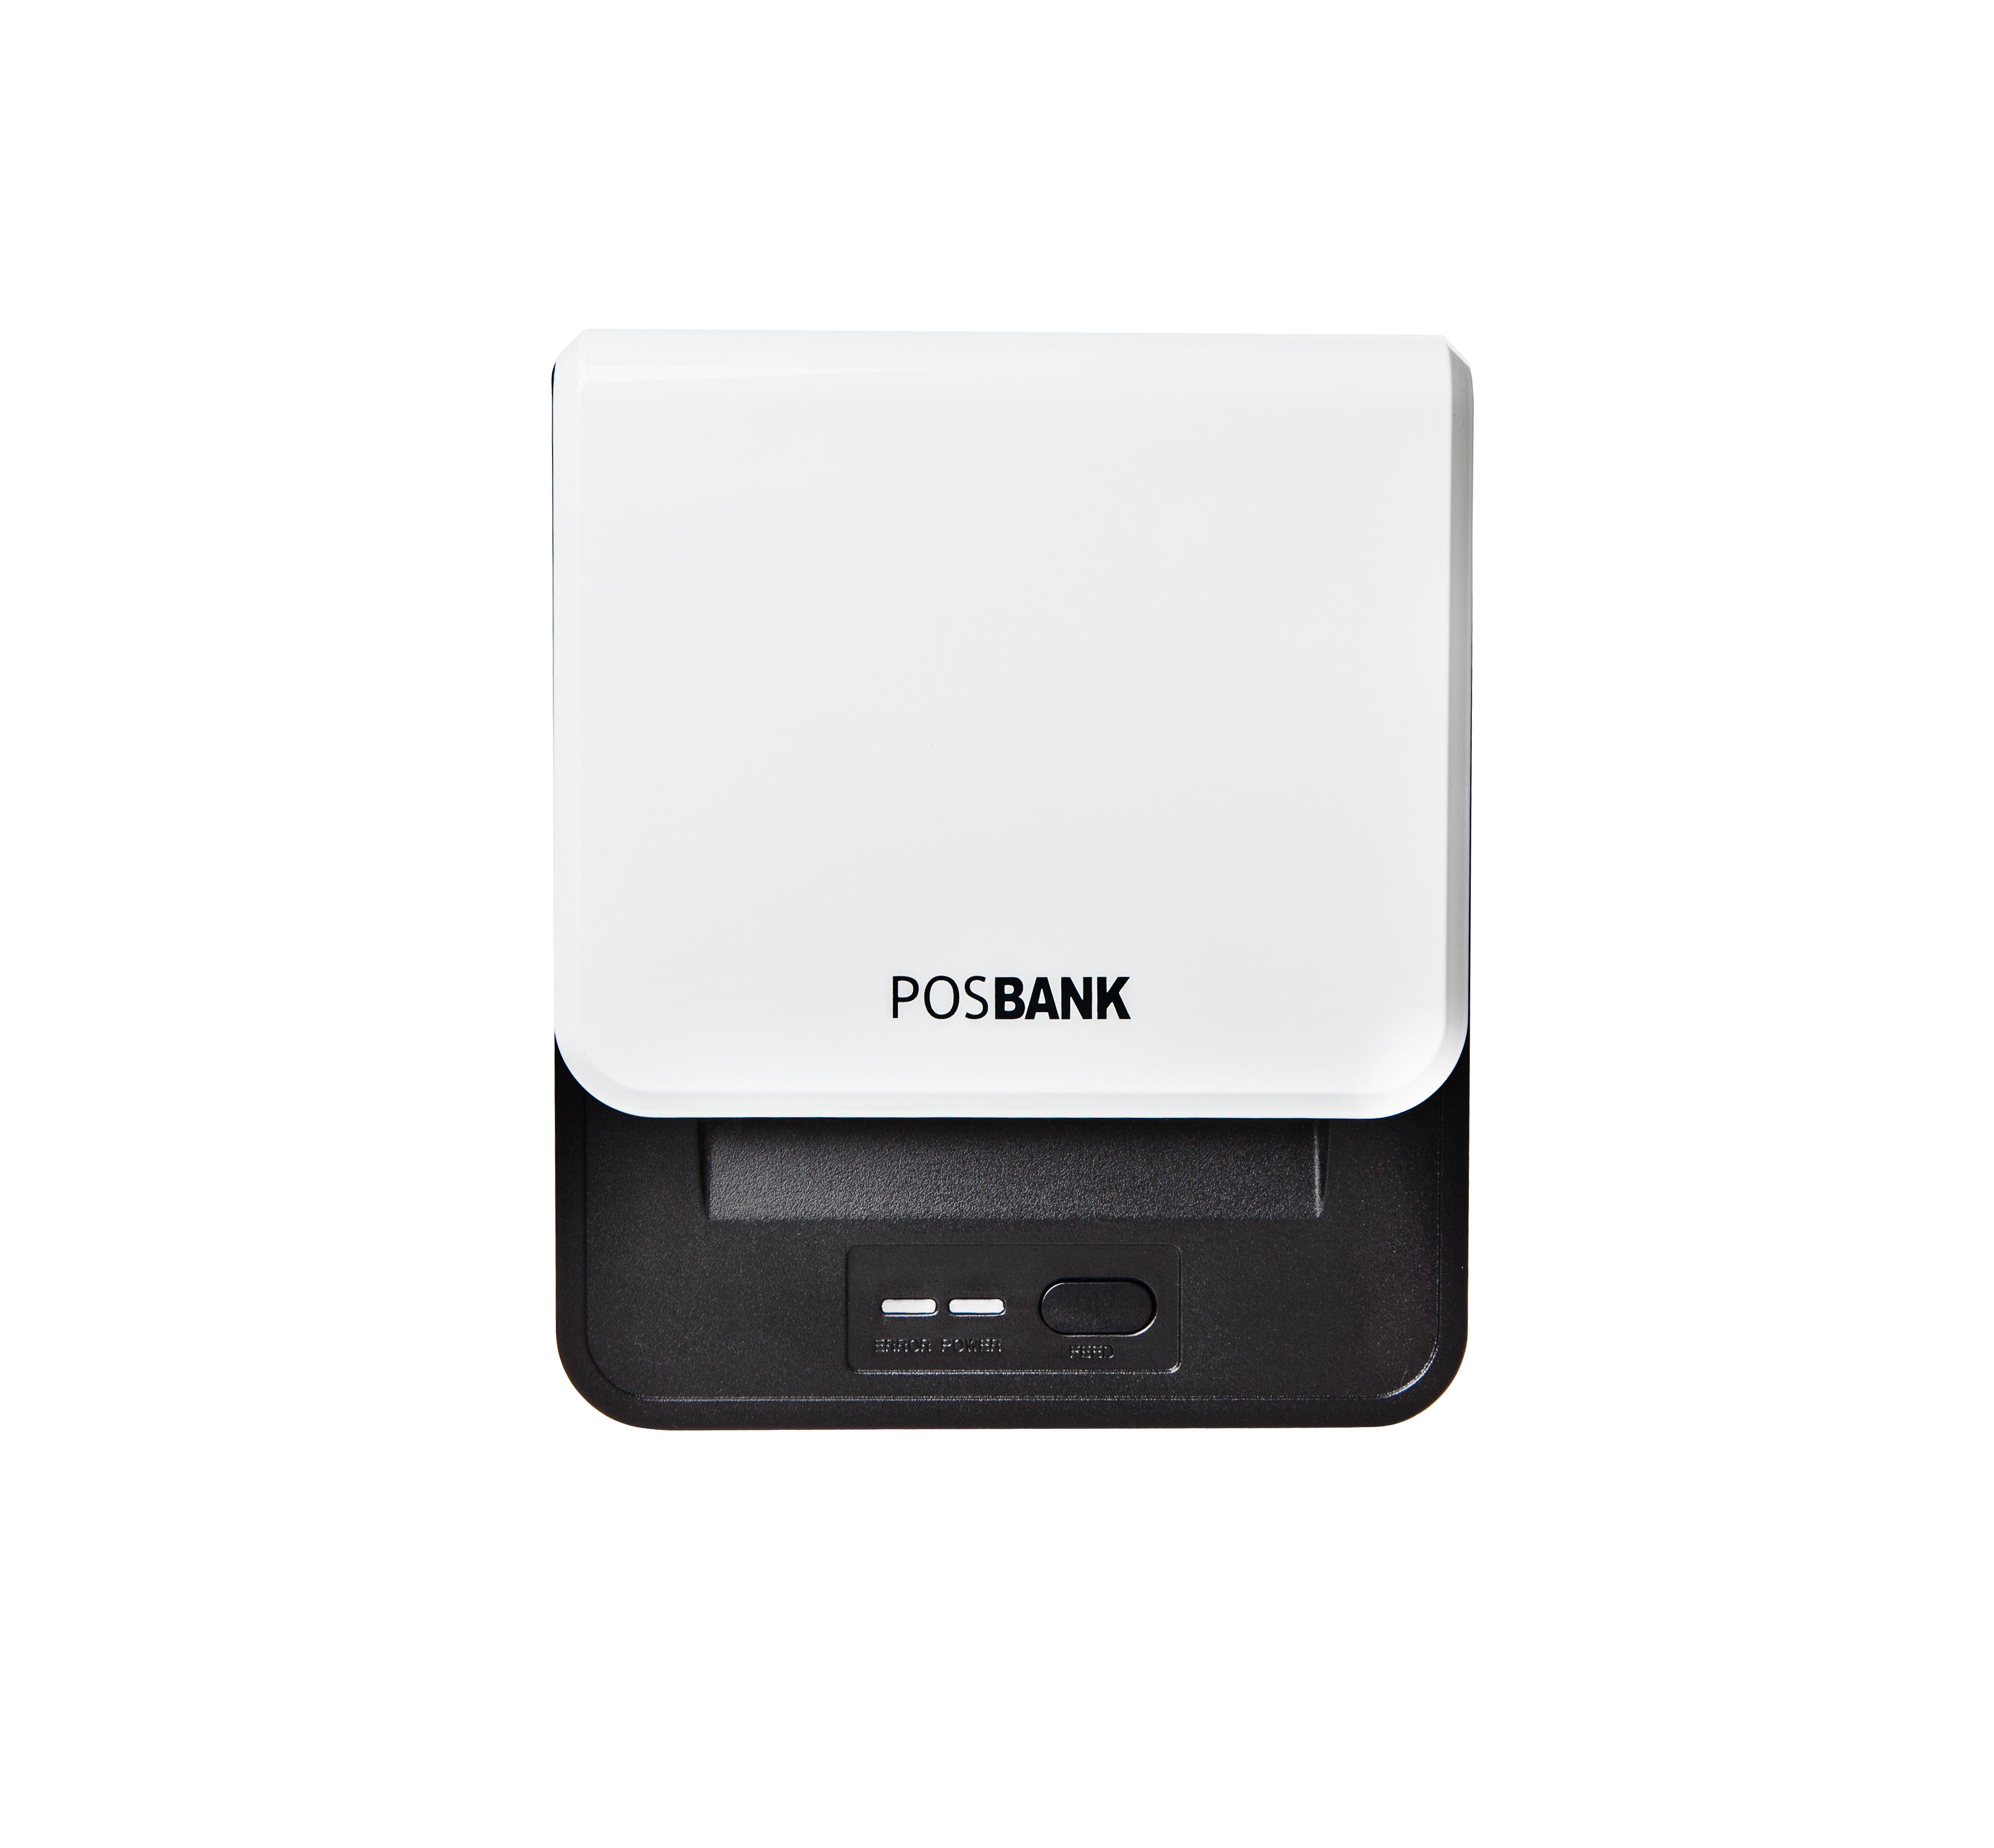 posbank-A7-receipt-printer-002.jpg